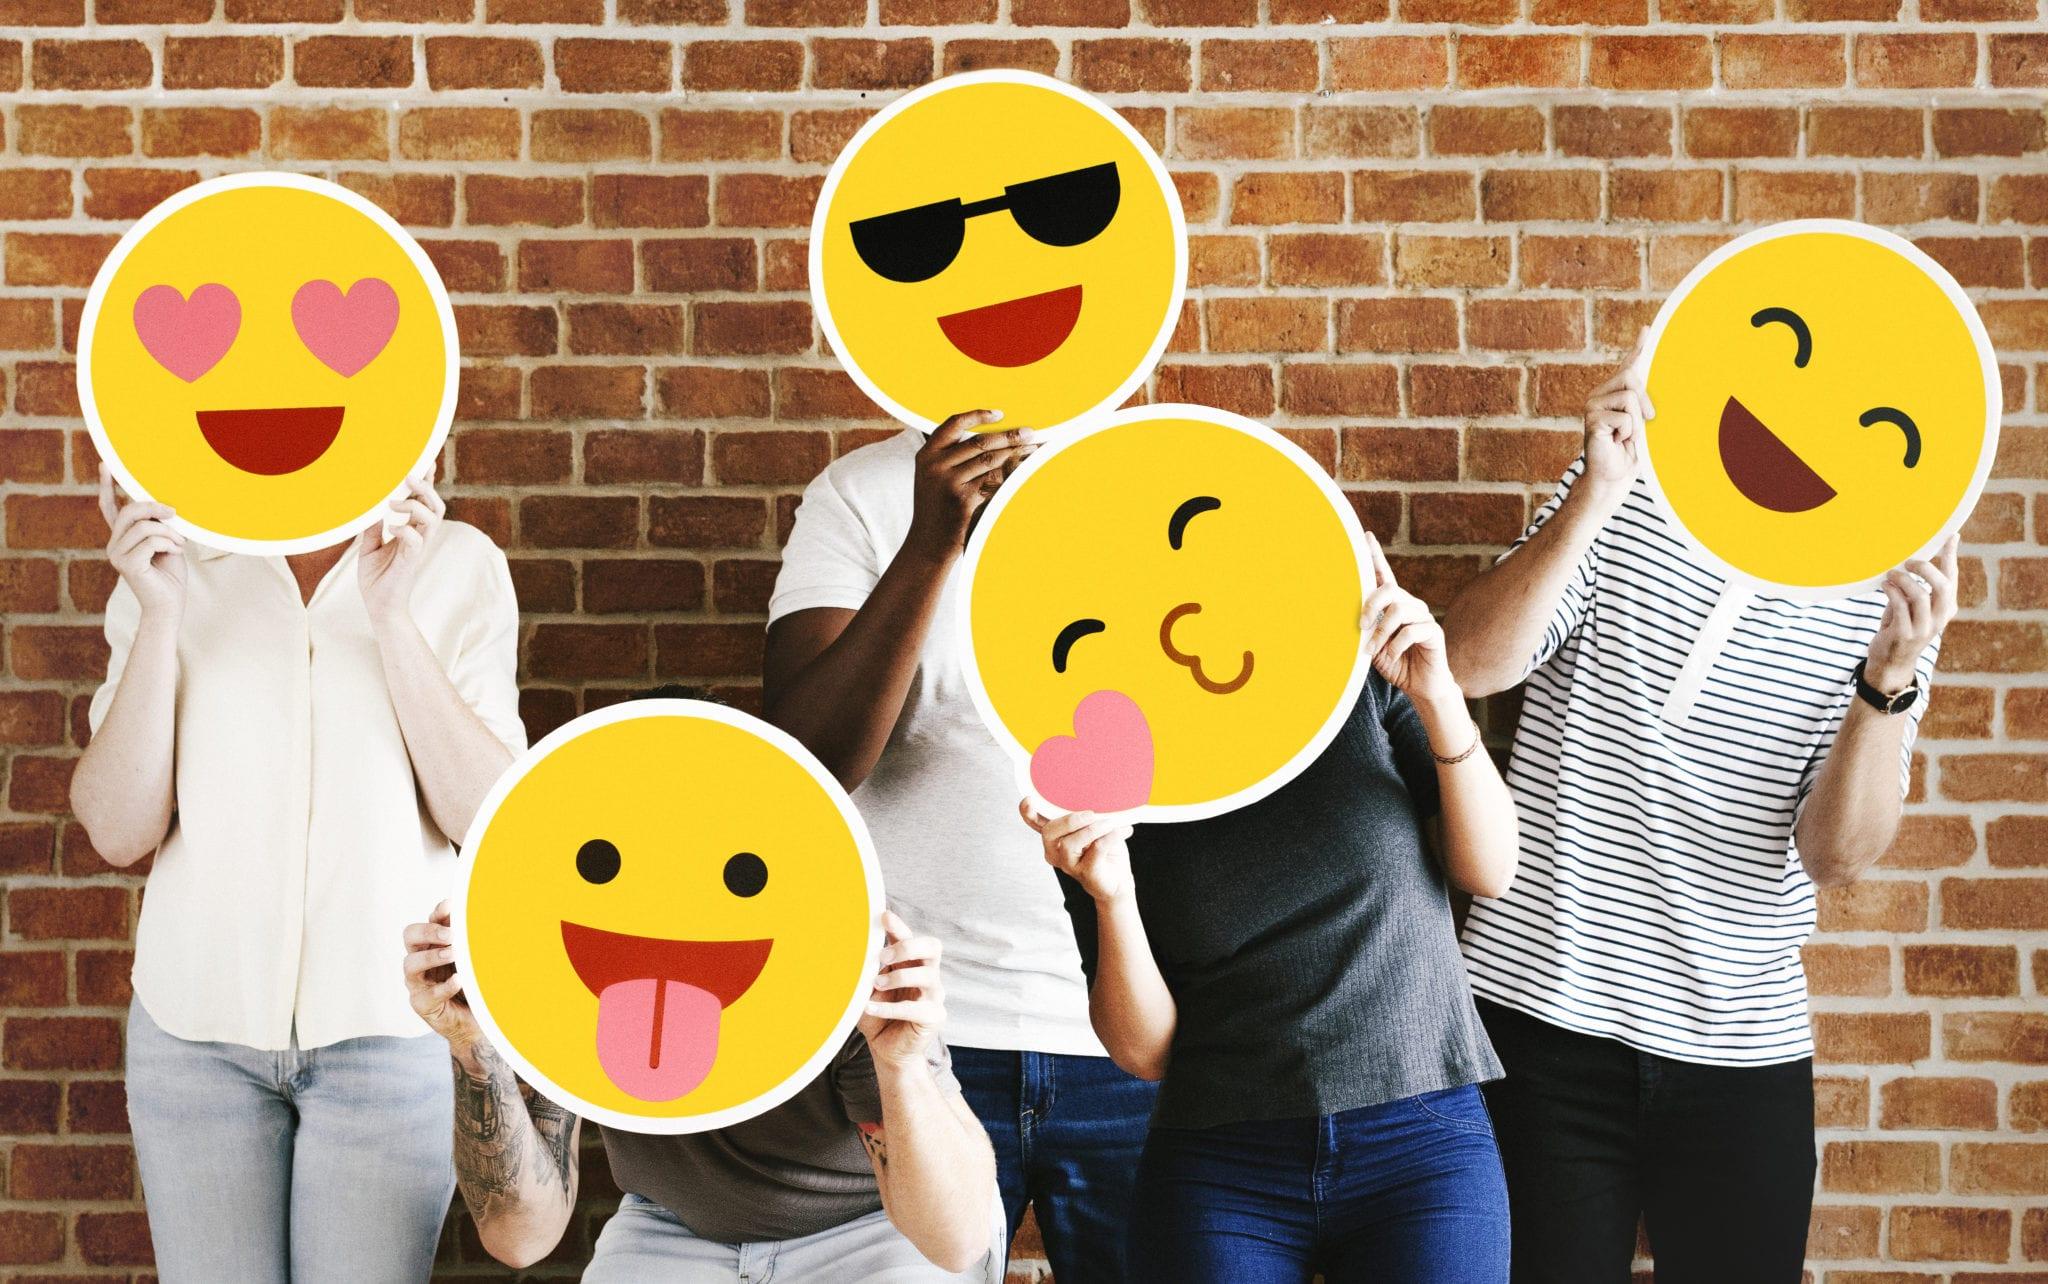 Apple Reveals New Emojis for World Emoji Day 2019 ⭐🎉